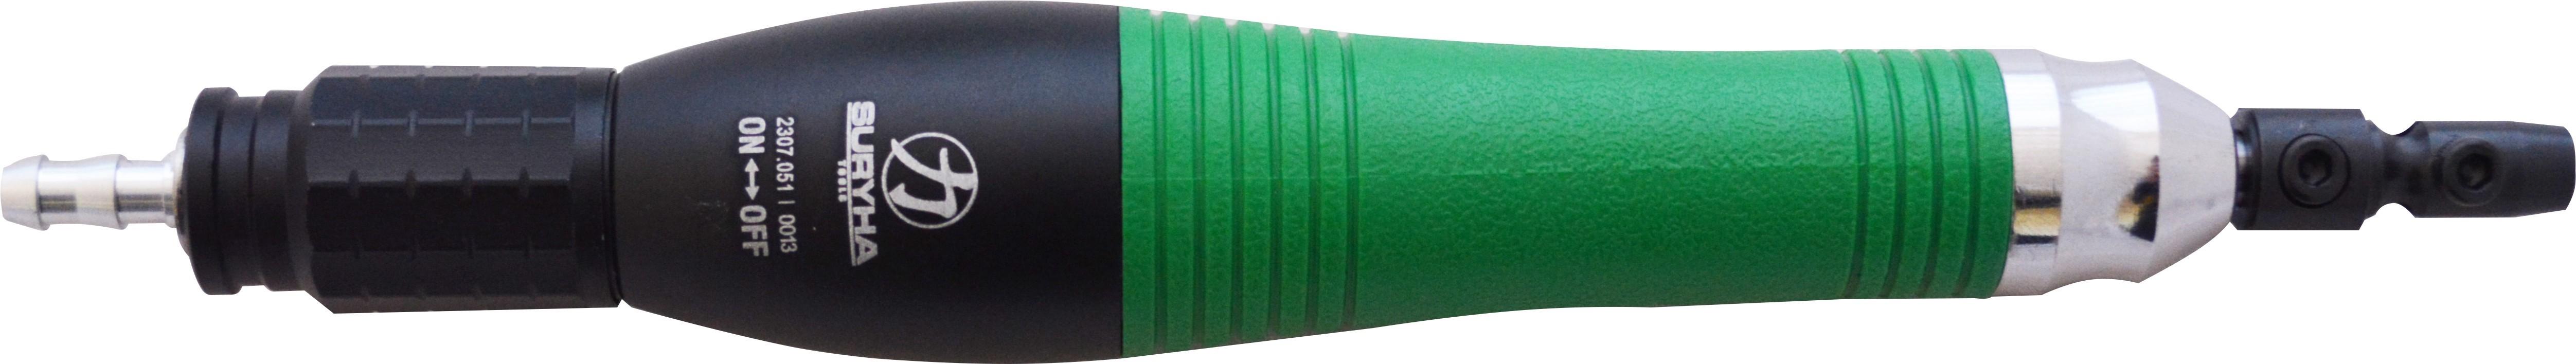 Limadora 35.000Bpm Curso 0,7mm Suryha